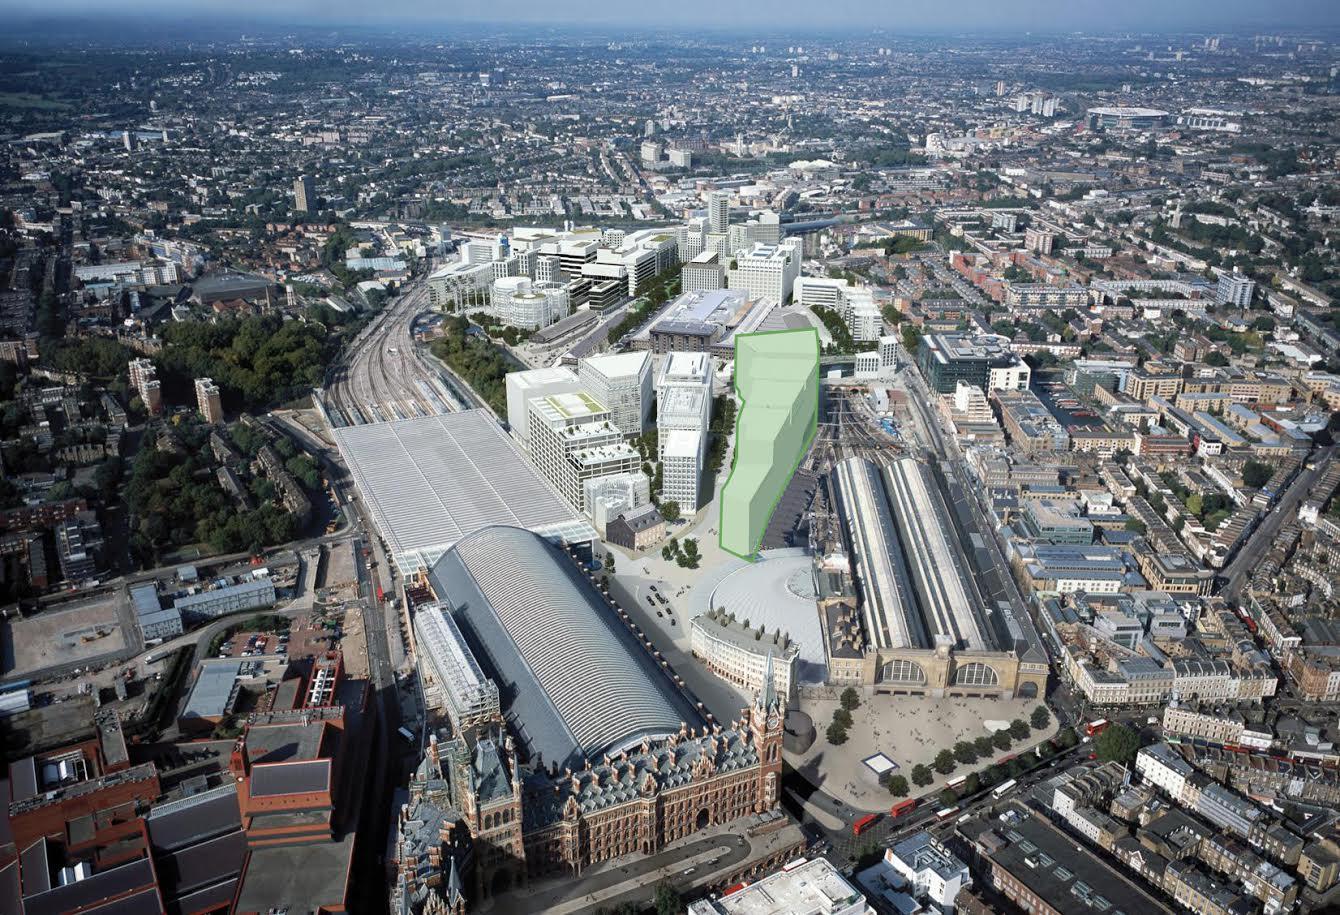 Google Kings Cross London HQ